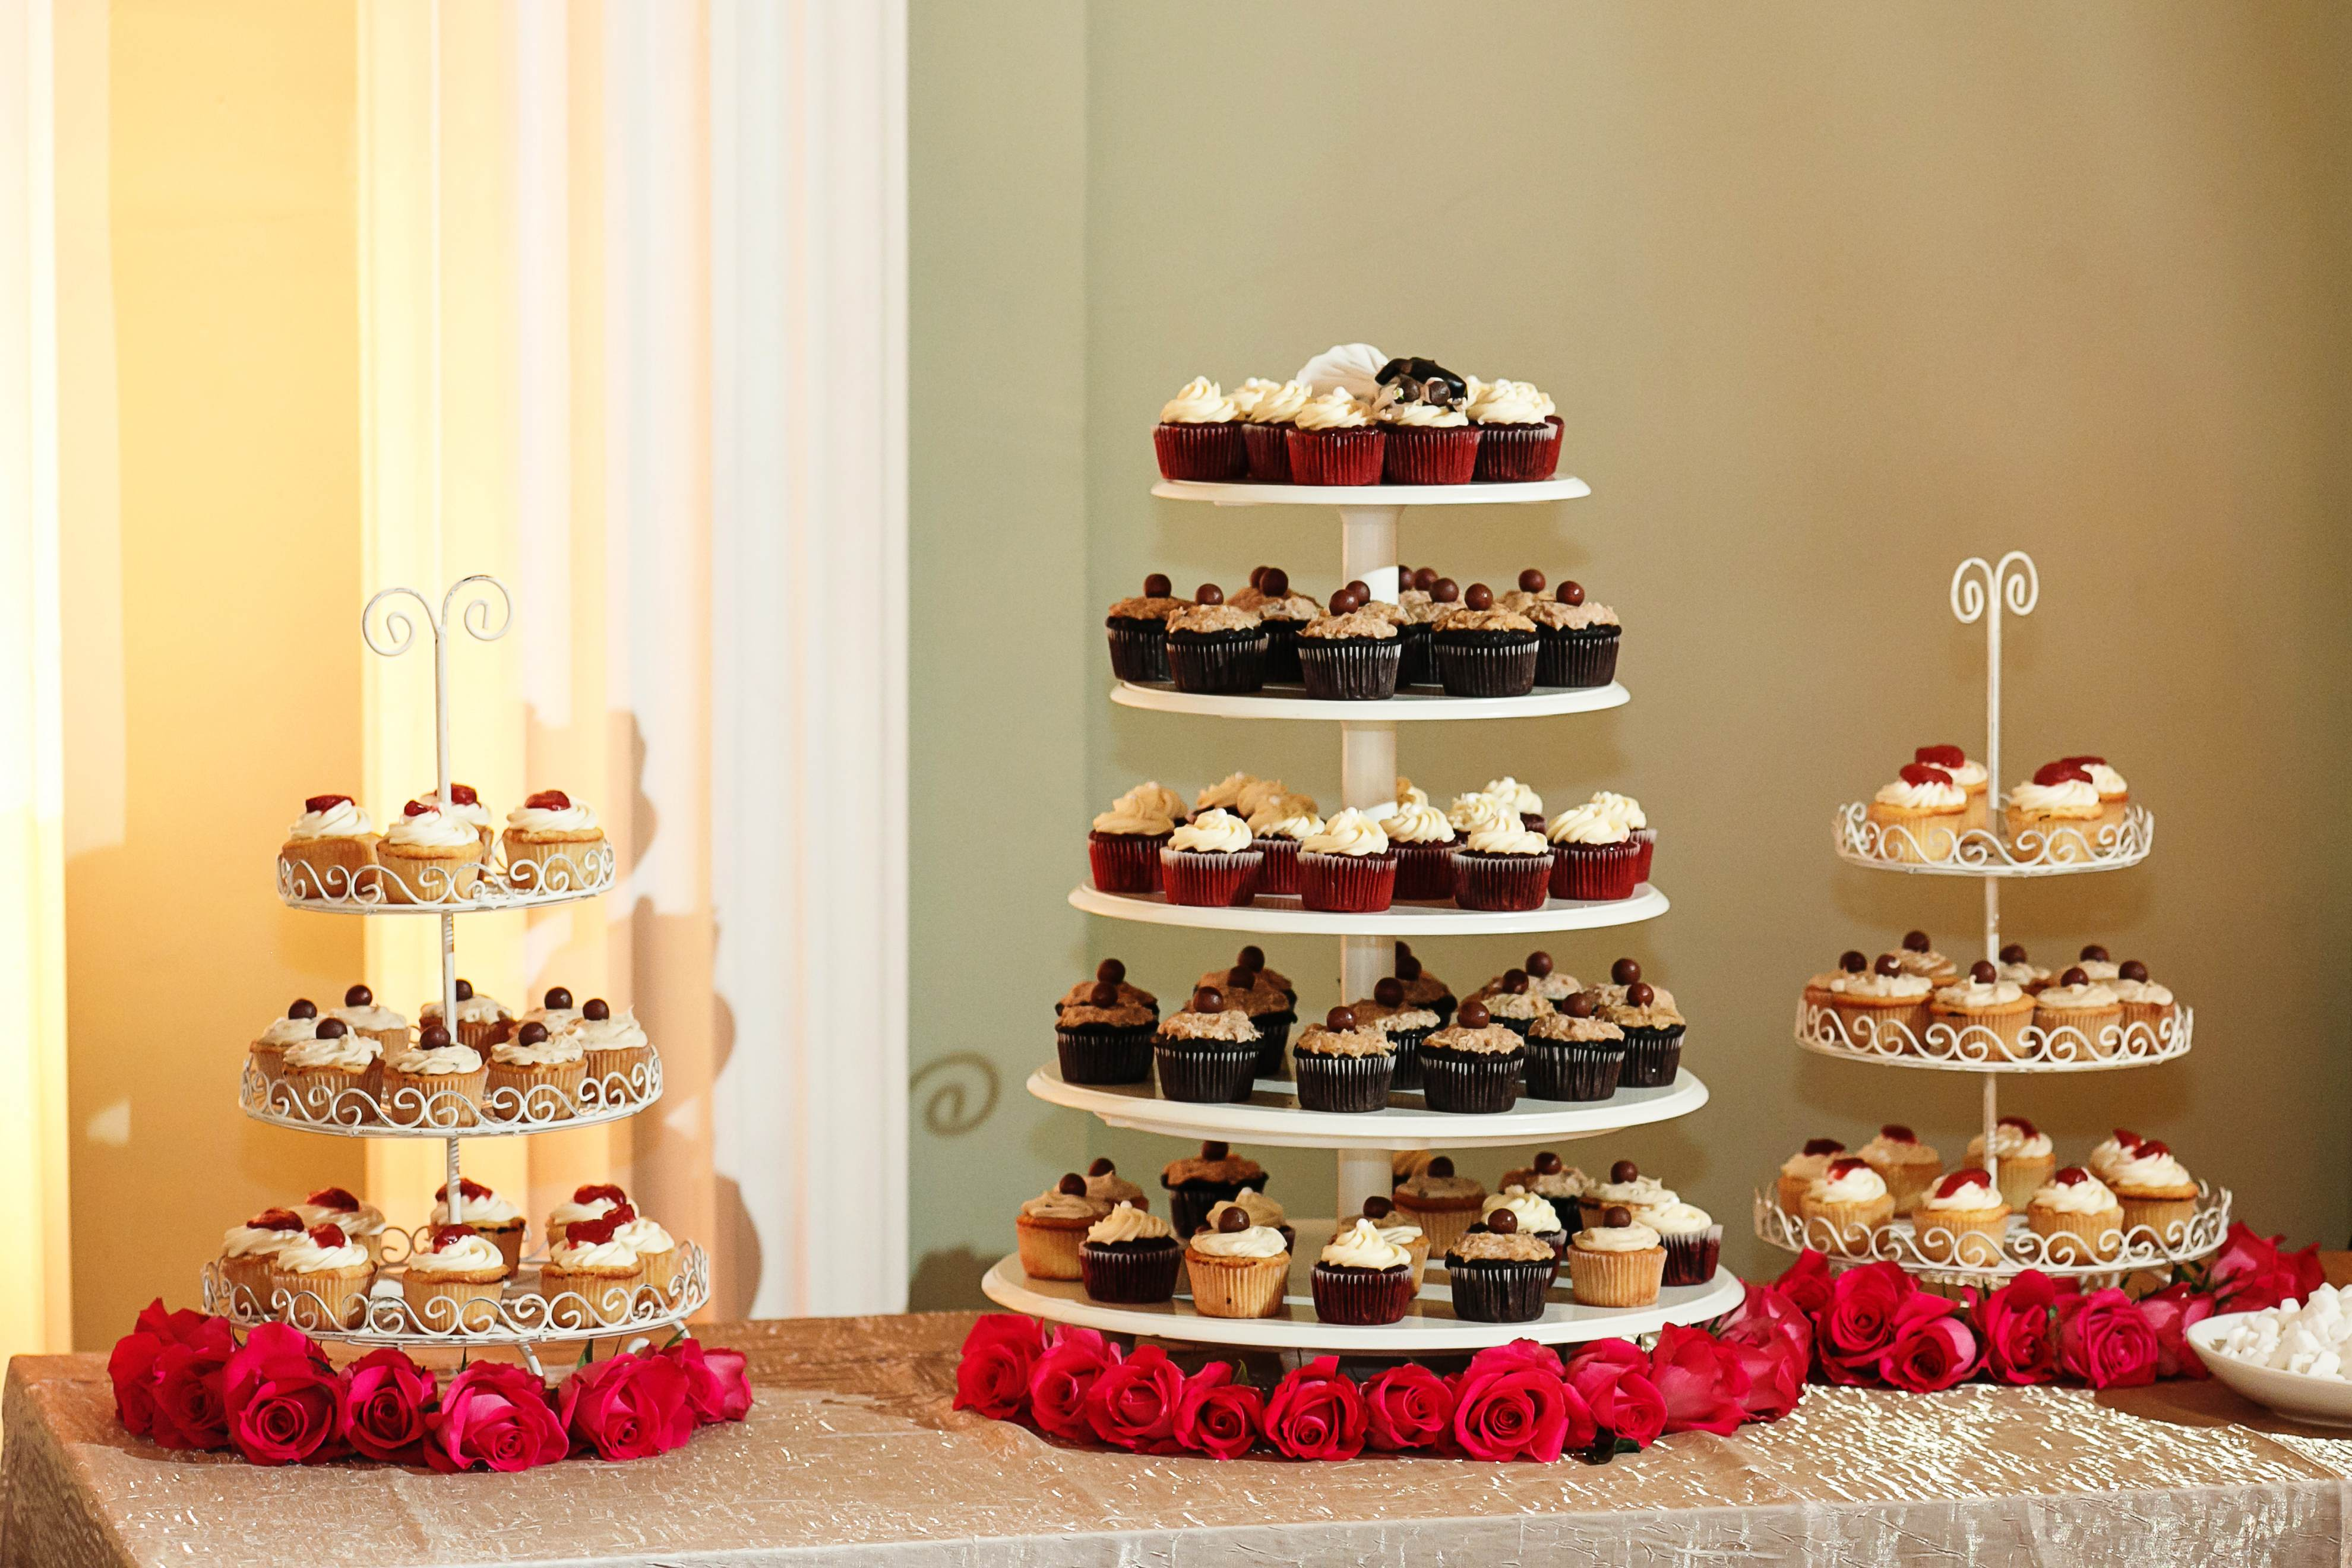 wedding dessert table, cupcakes on cake stand